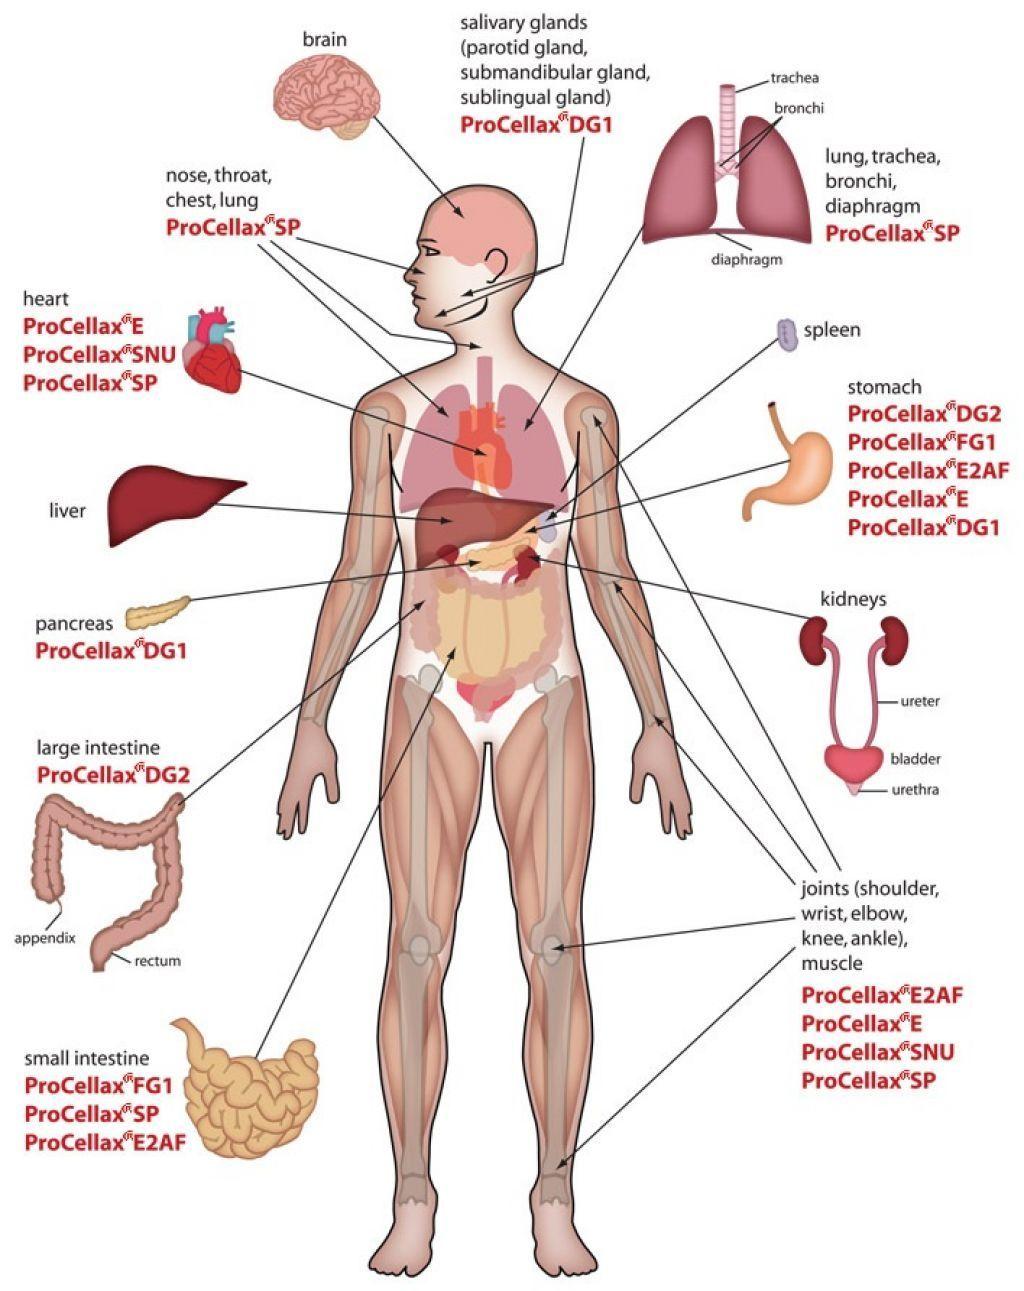 medium resolution of human body picture of organs human body picture of organs human body anatomy internal organs